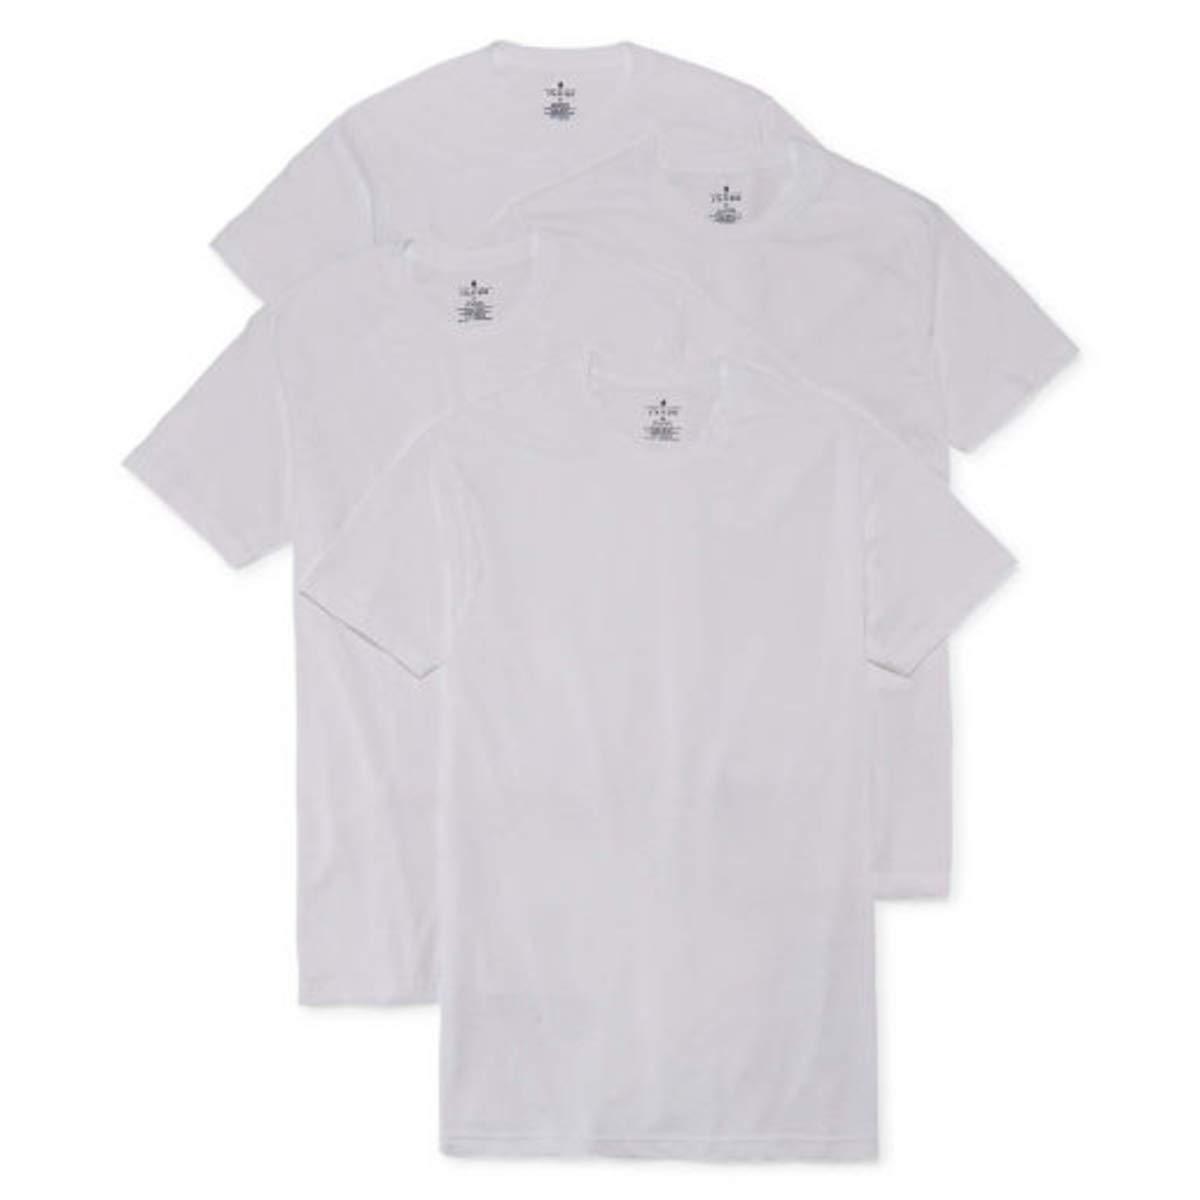 Stafford 4-Pack Men's Heavy Weight 100% Cotton Crew-Neck T-Shirt White